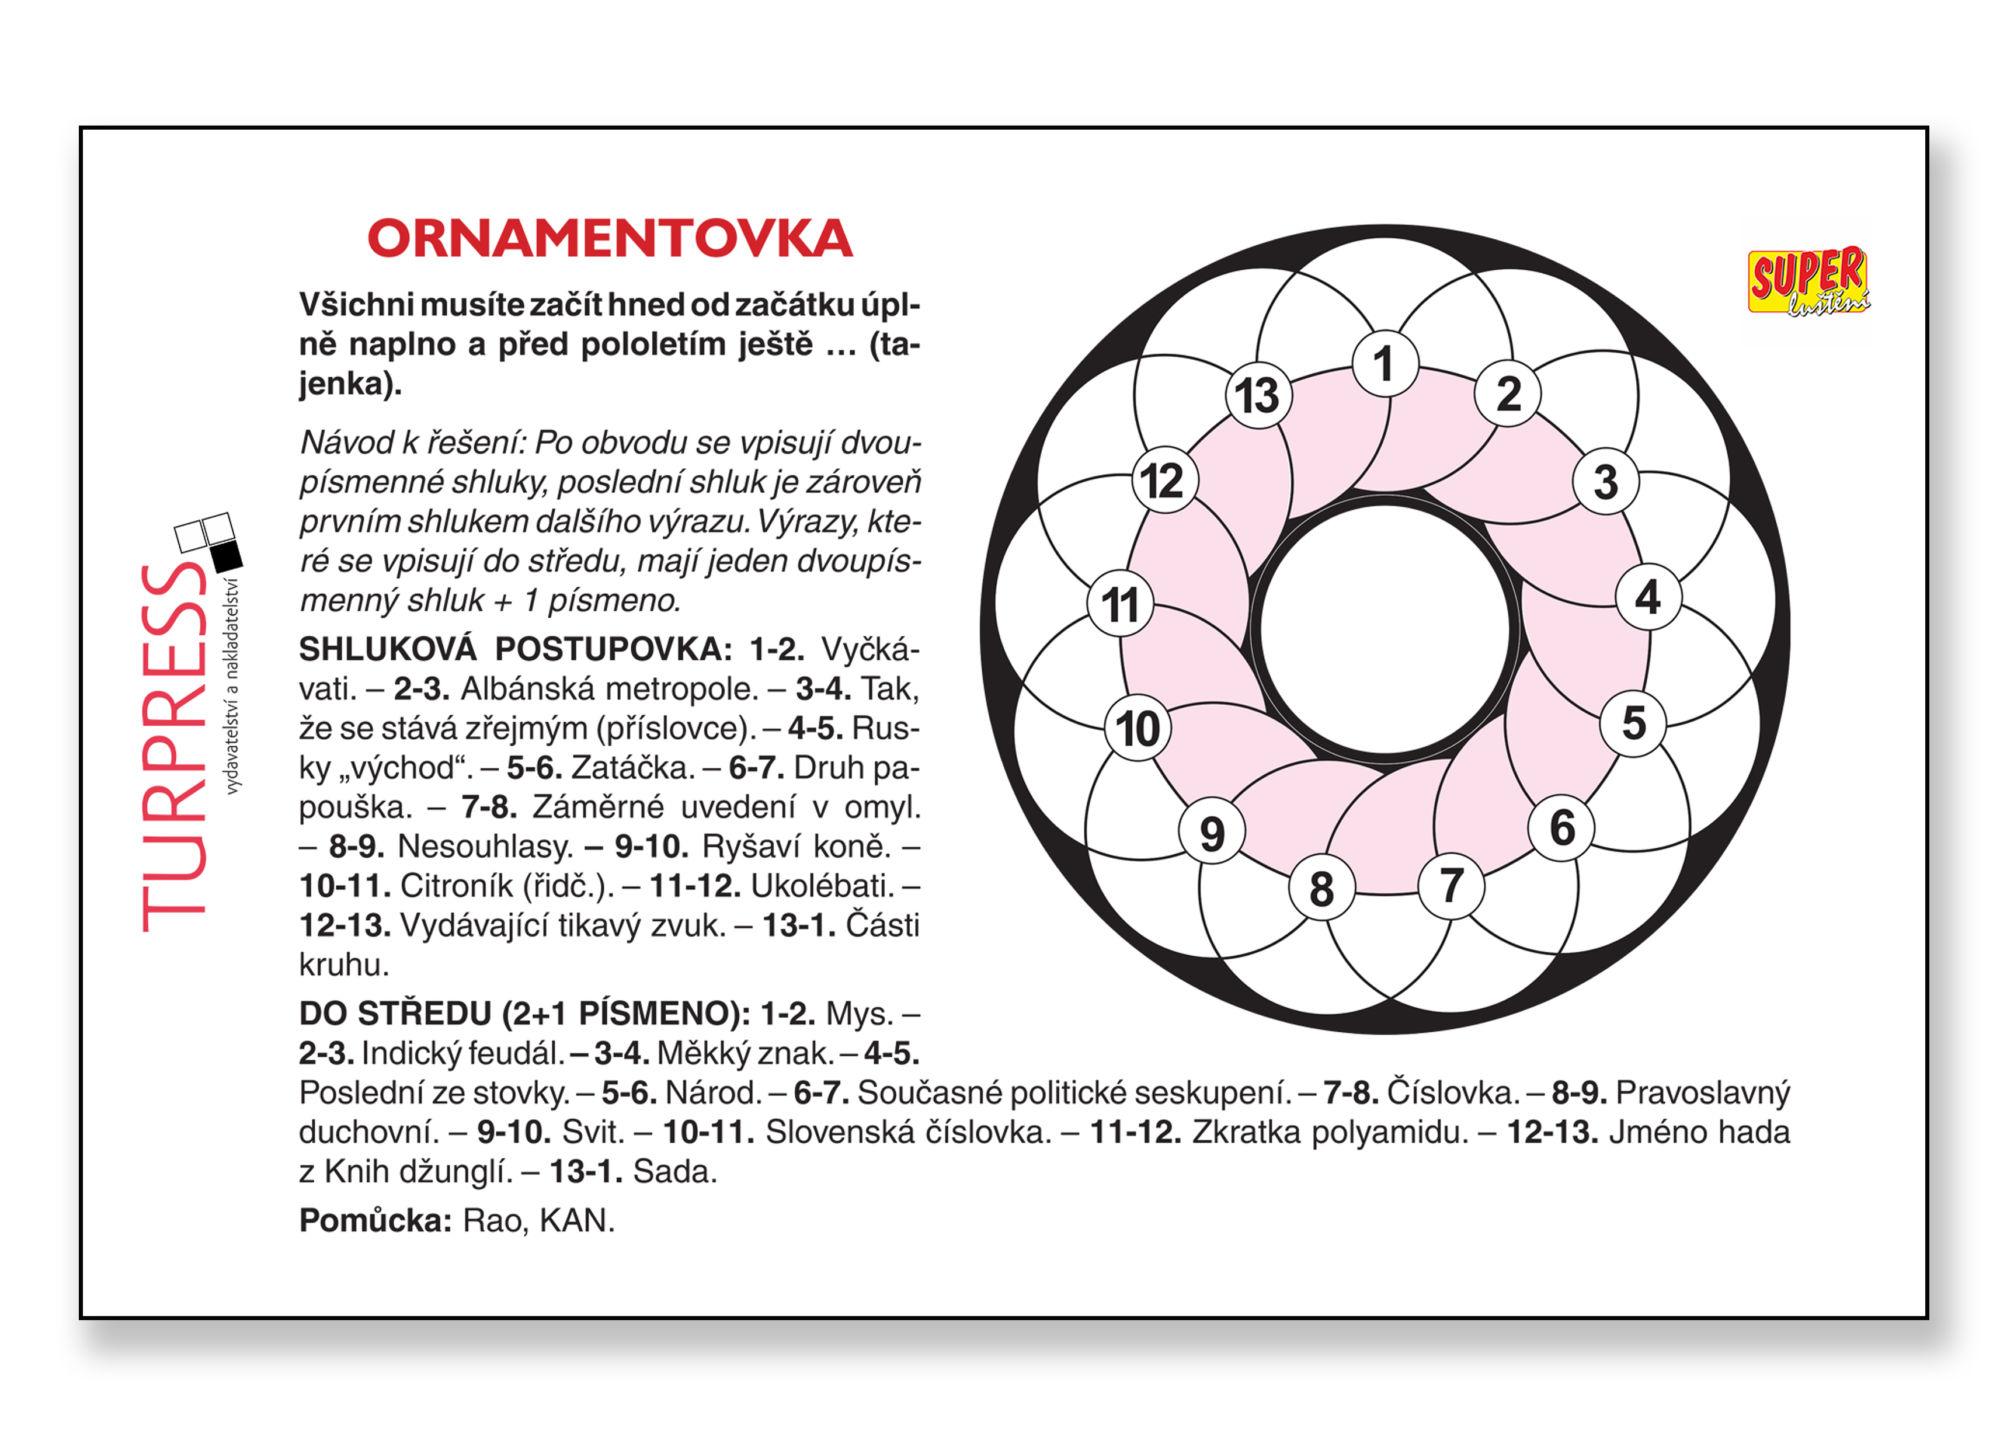 Ornamentovka